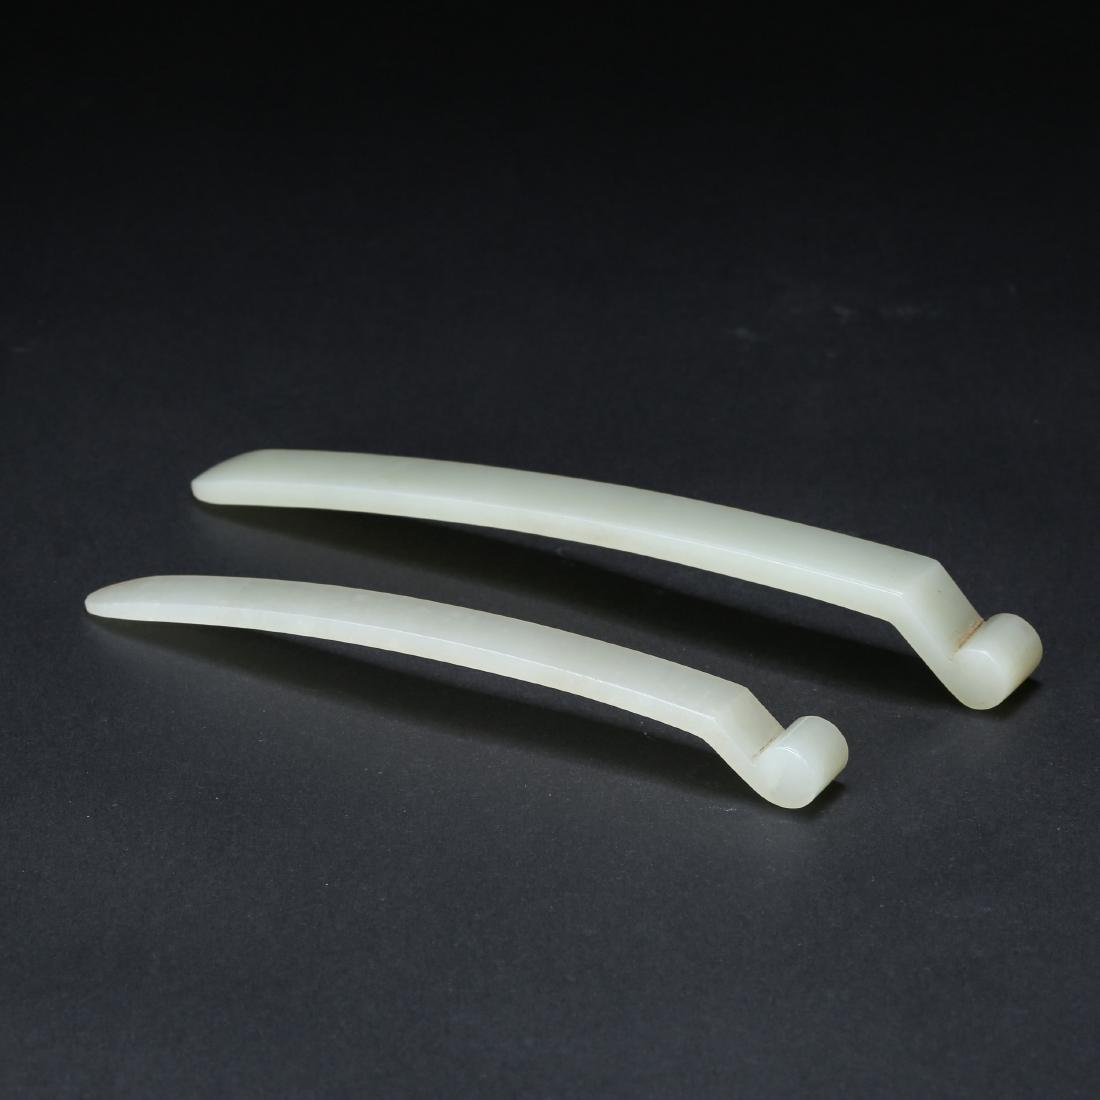 TWO CHINESE WHITE JADE HAIR PINS